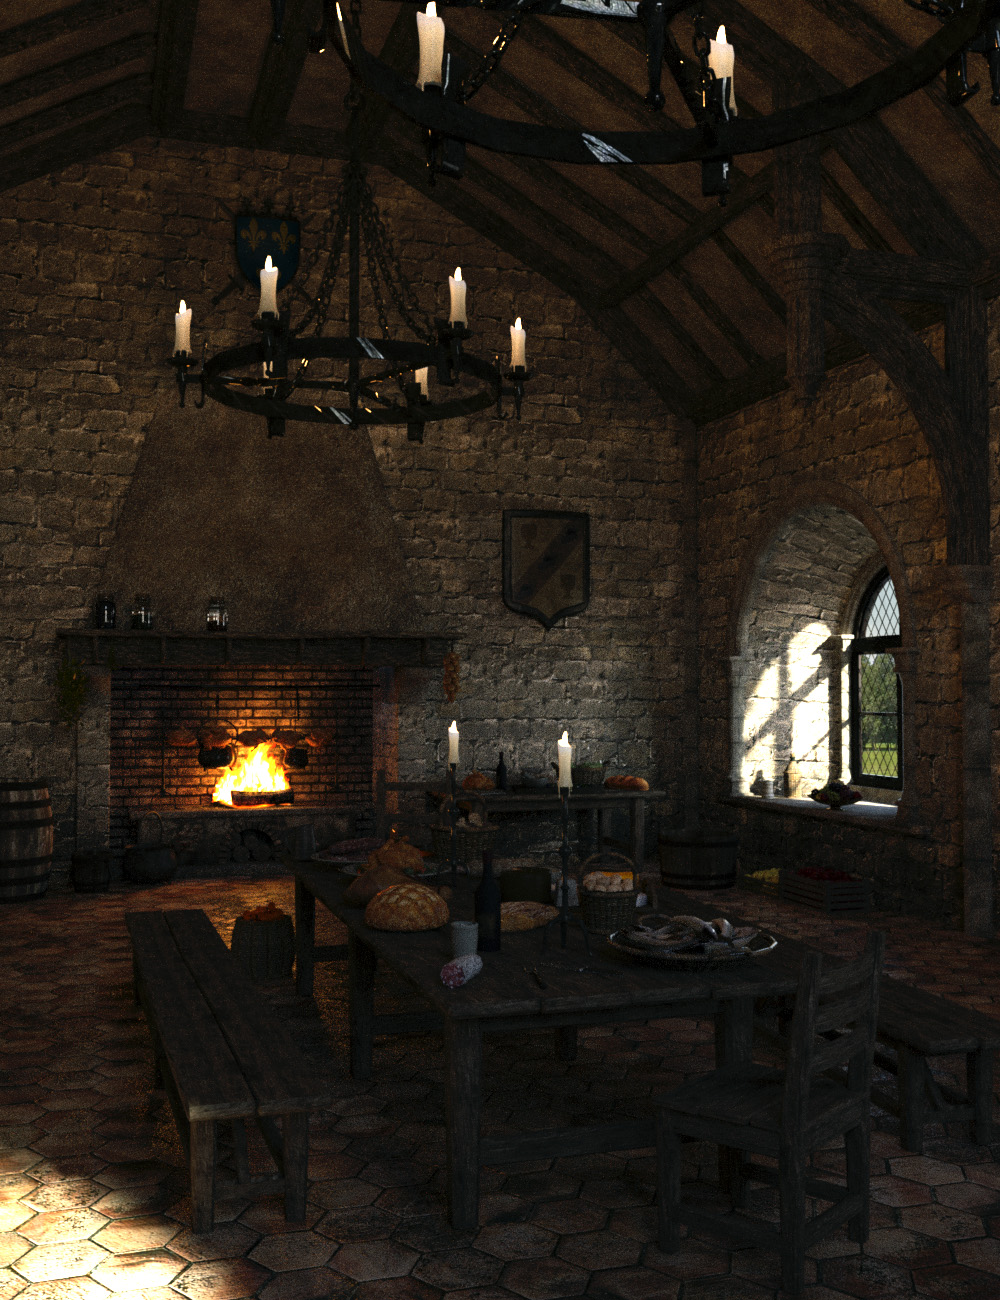 MICK-Kitchen by: Faveral, 3D Models by Daz 3D